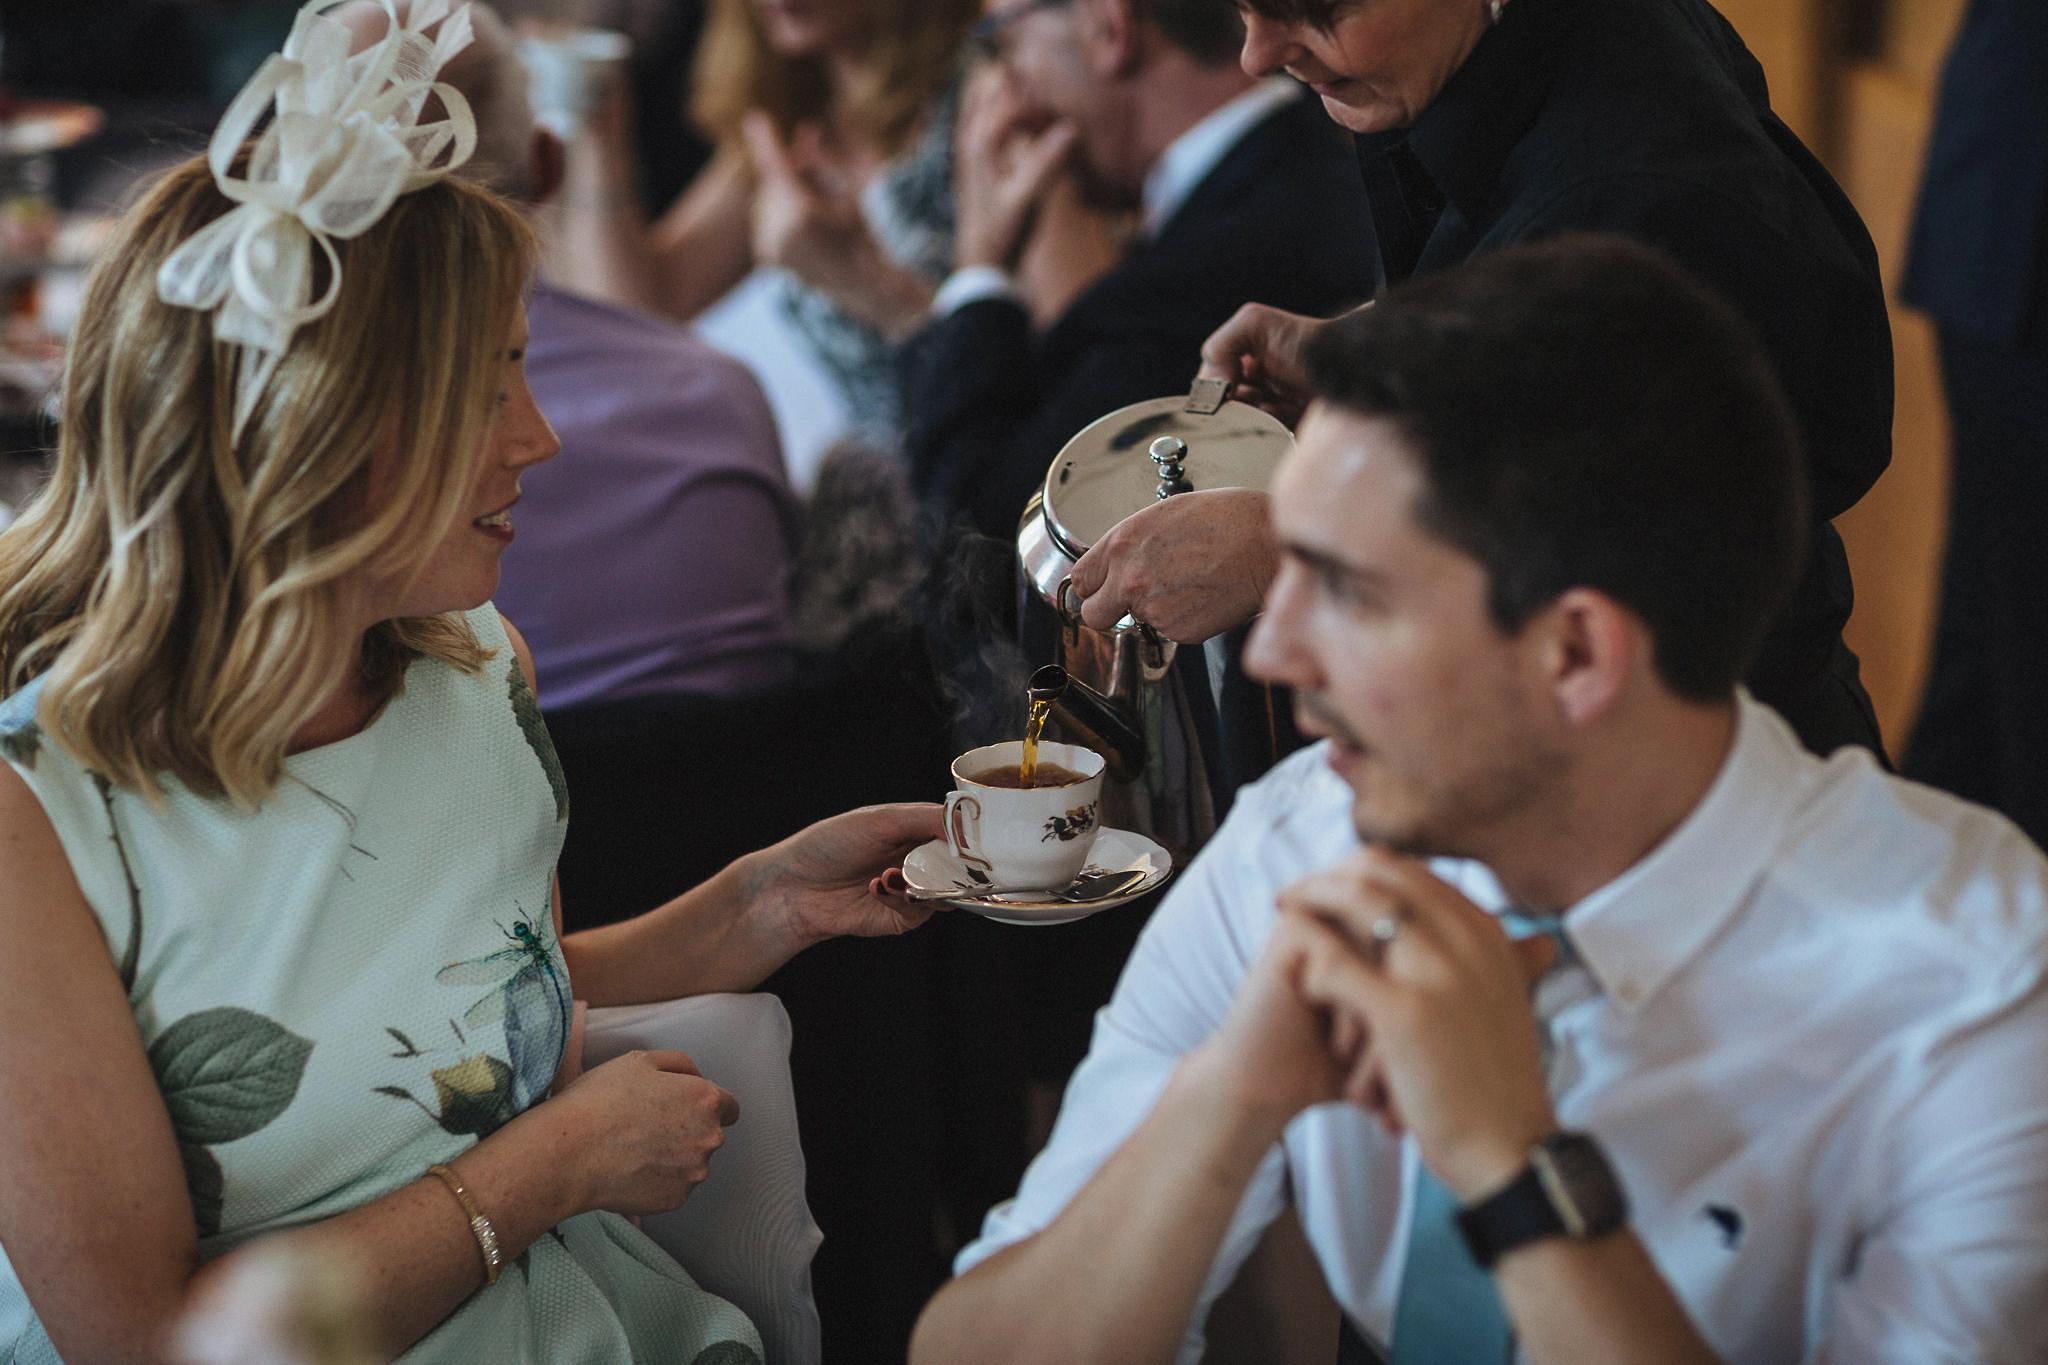 Lancashire-Creative-natural-documentary-wedding-photography-90065